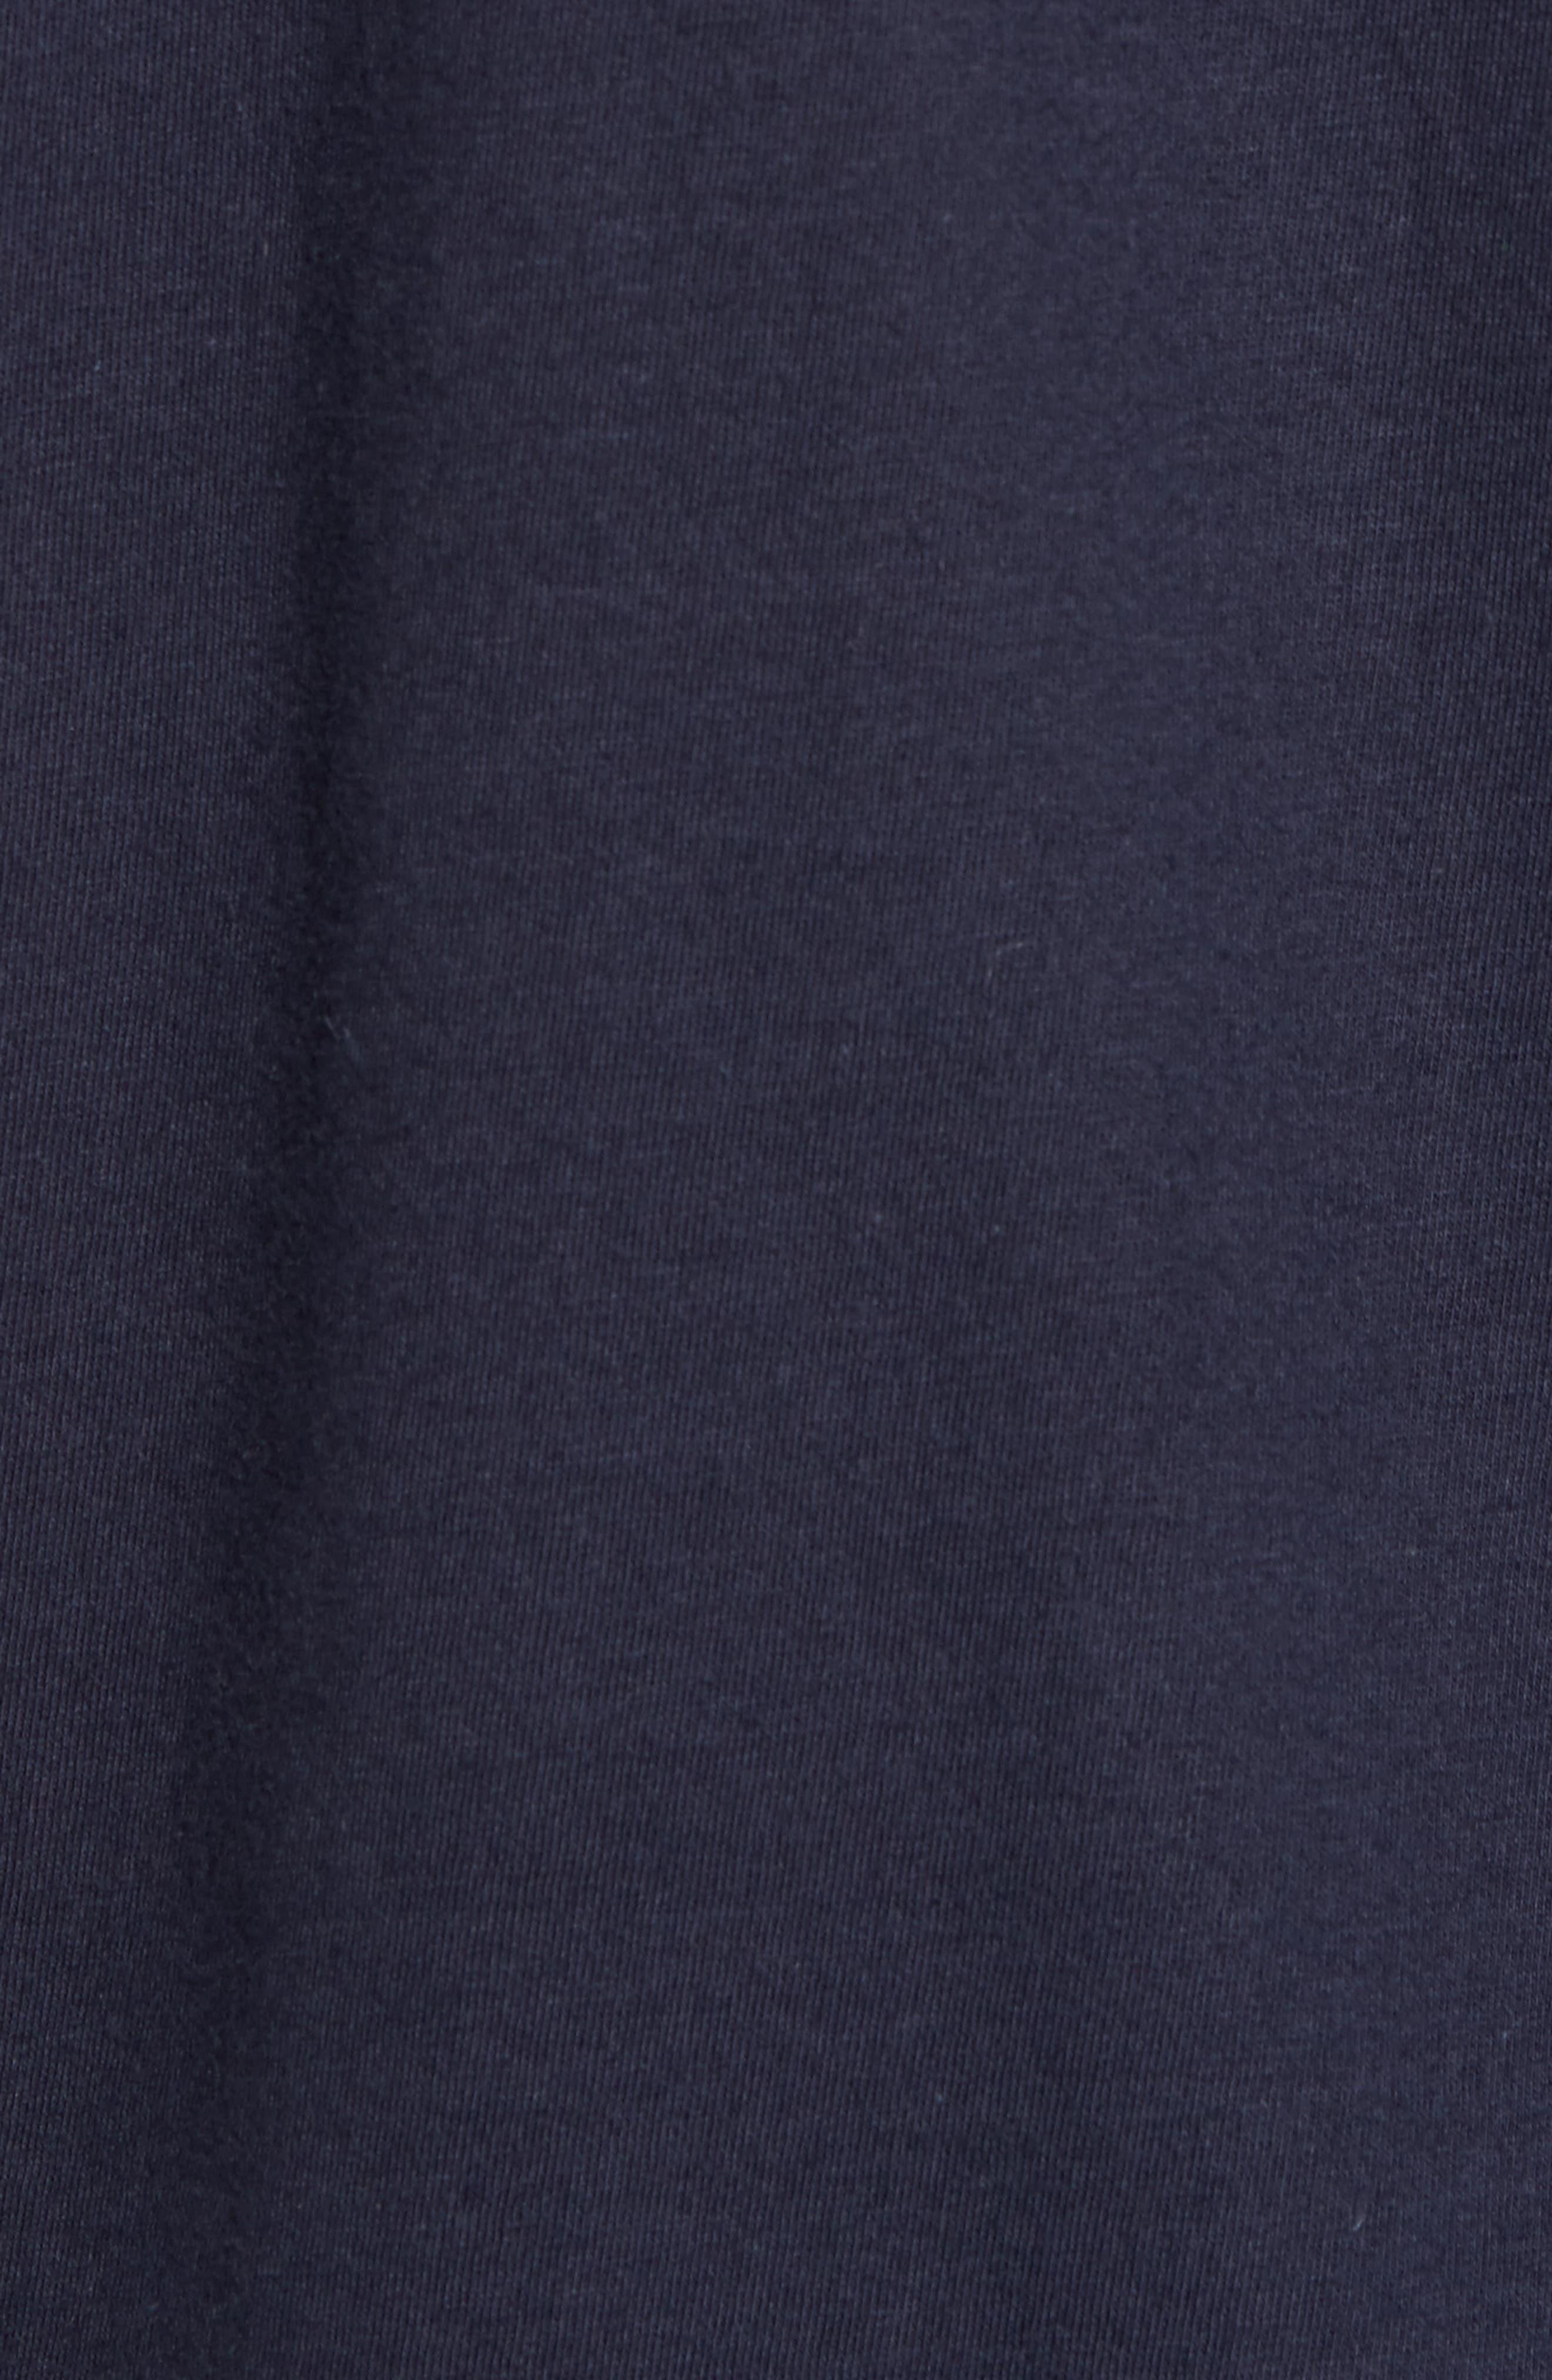 Skyline Arch 3D Graphic T-Shirt,                             Alternate thumbnail 5, color,                             411